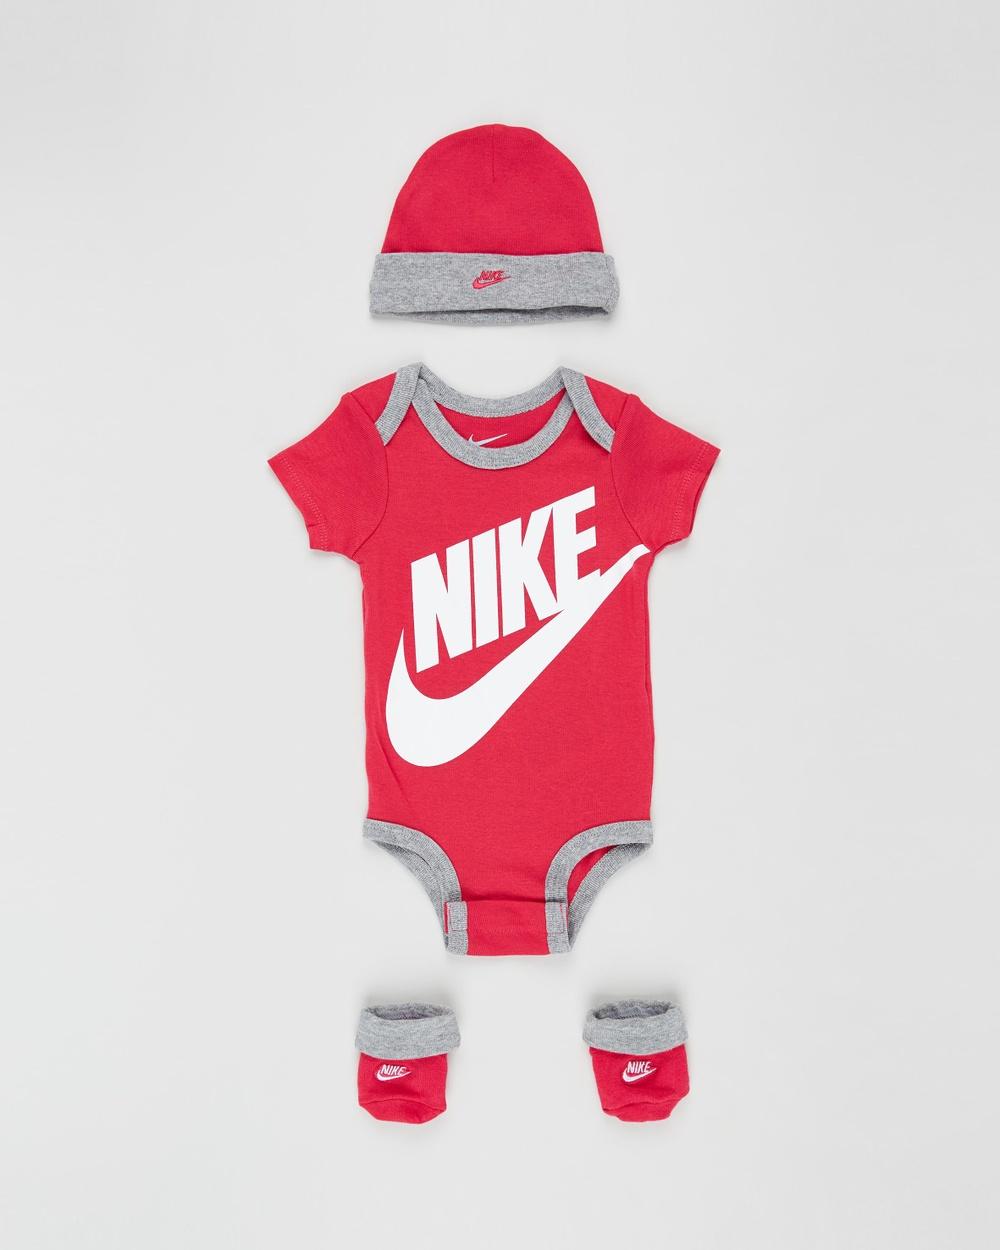 Nike Futura Logo Boxed Set Babies Headwear Rush Pink